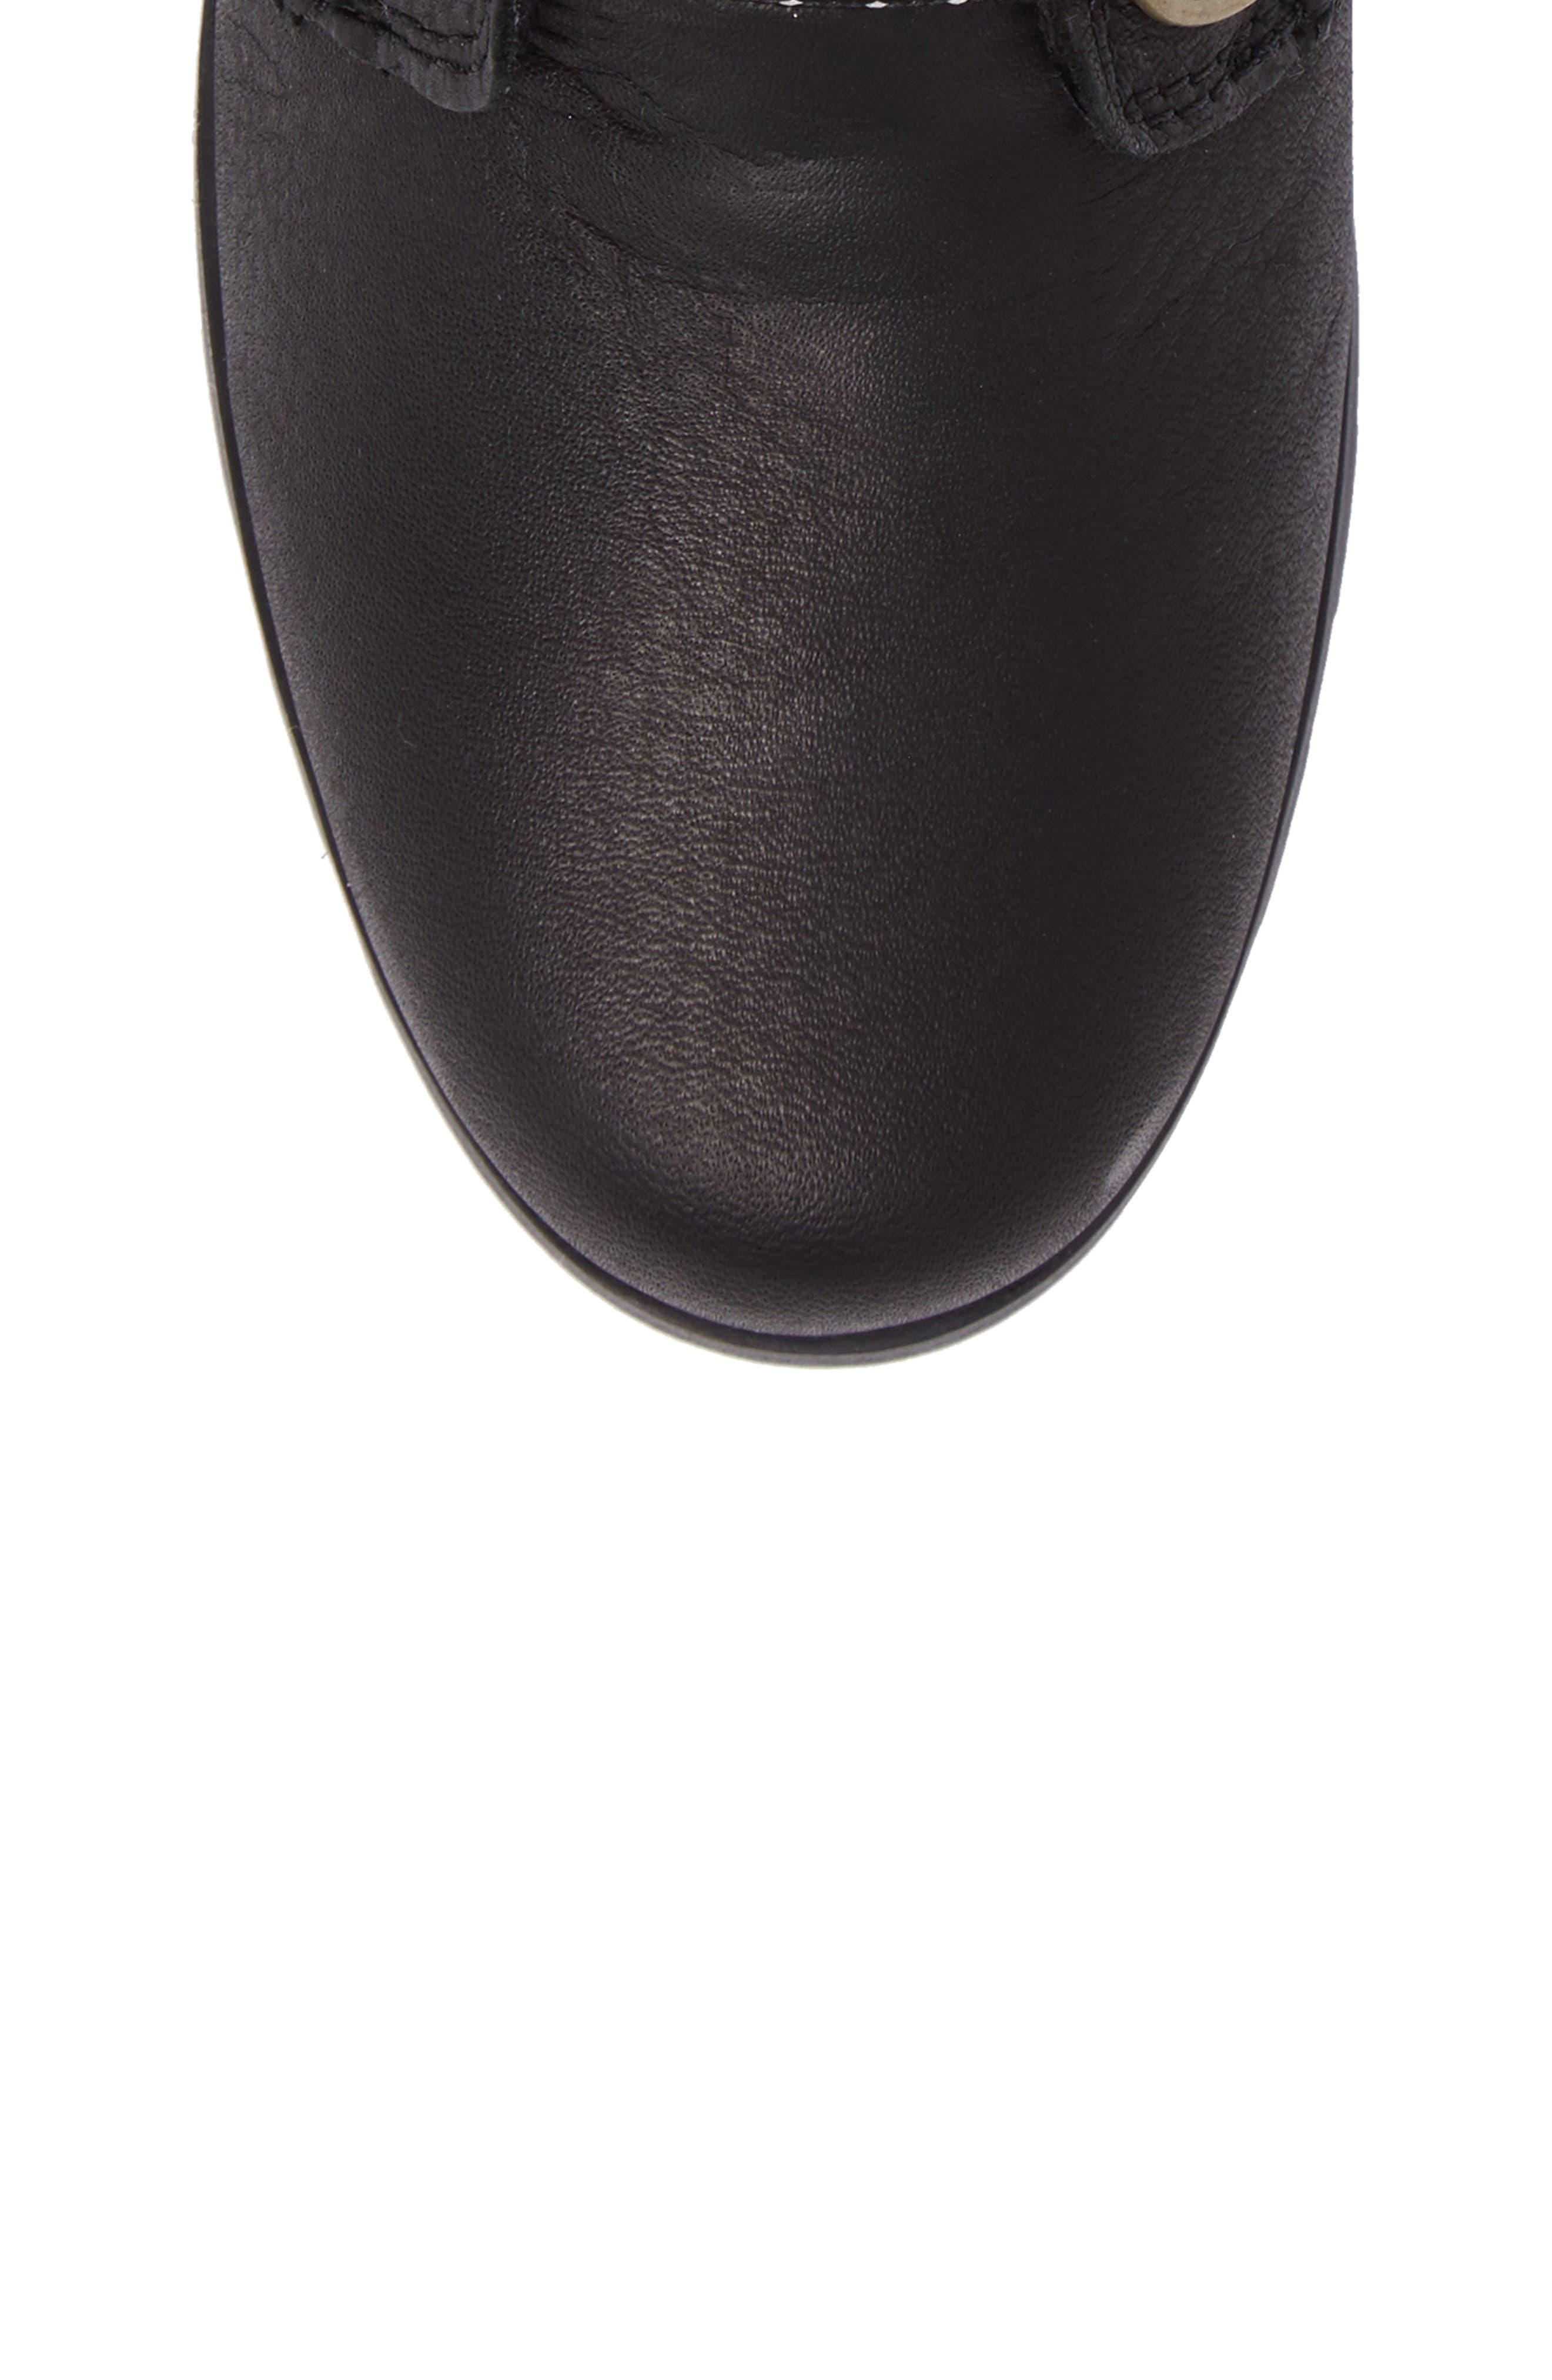 Emelie Waterproof Lace Up Boot with Faux Fur Trim,                             Alternate thumbnail 5, color,                             010